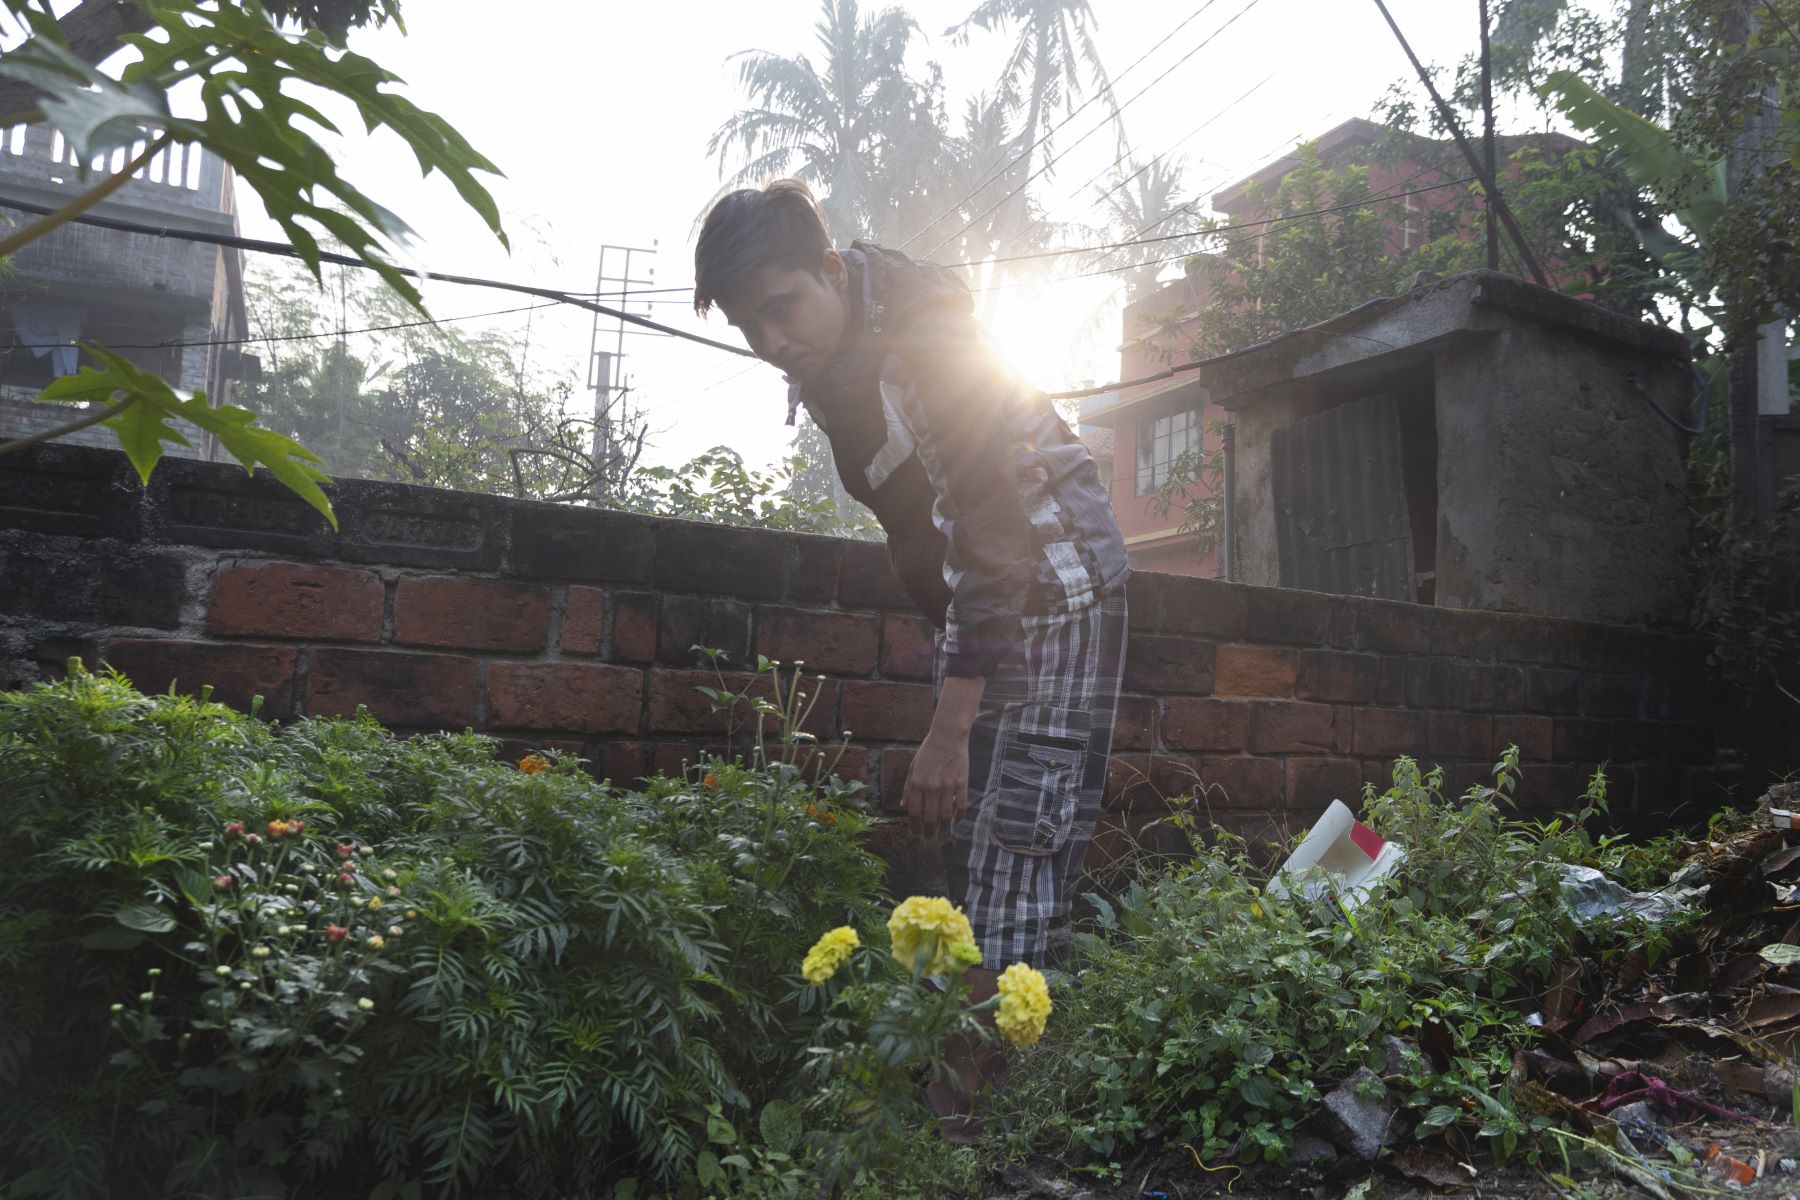 Ridim tending to his own garden